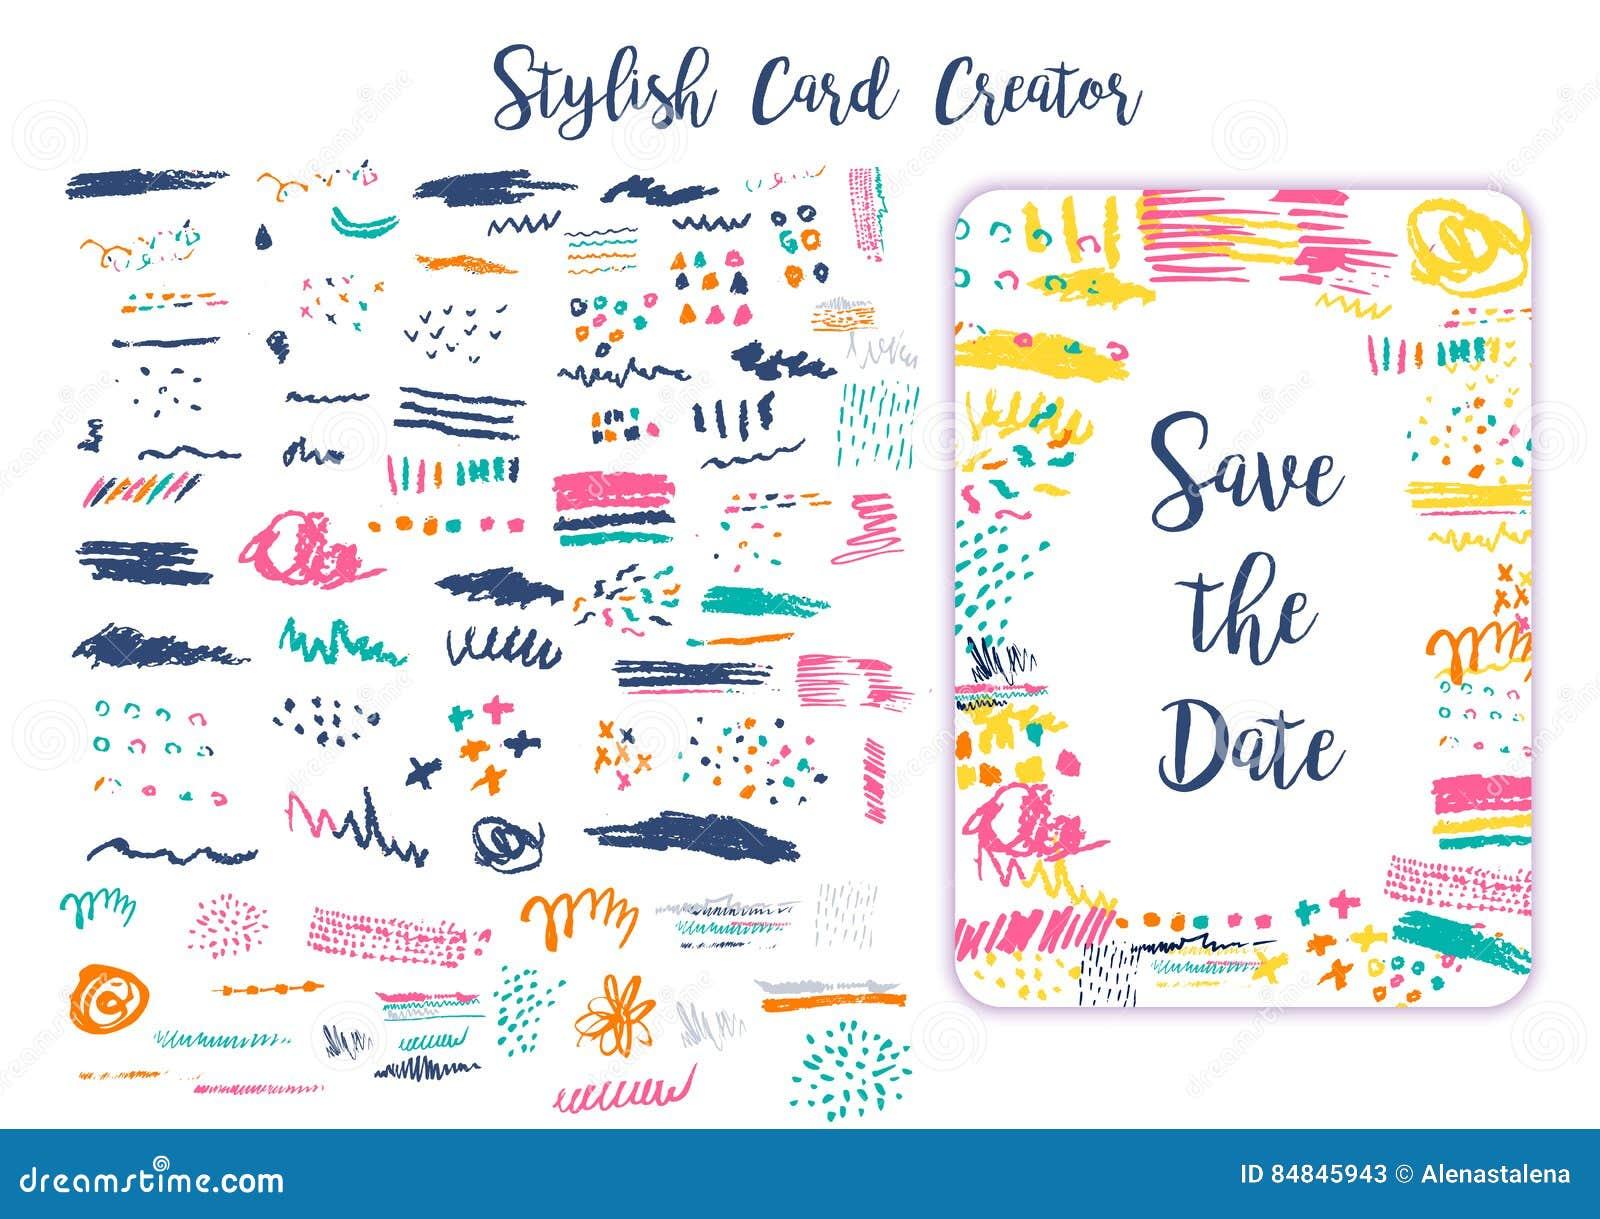 grunge artistic brush strokes set for creation creative design cards